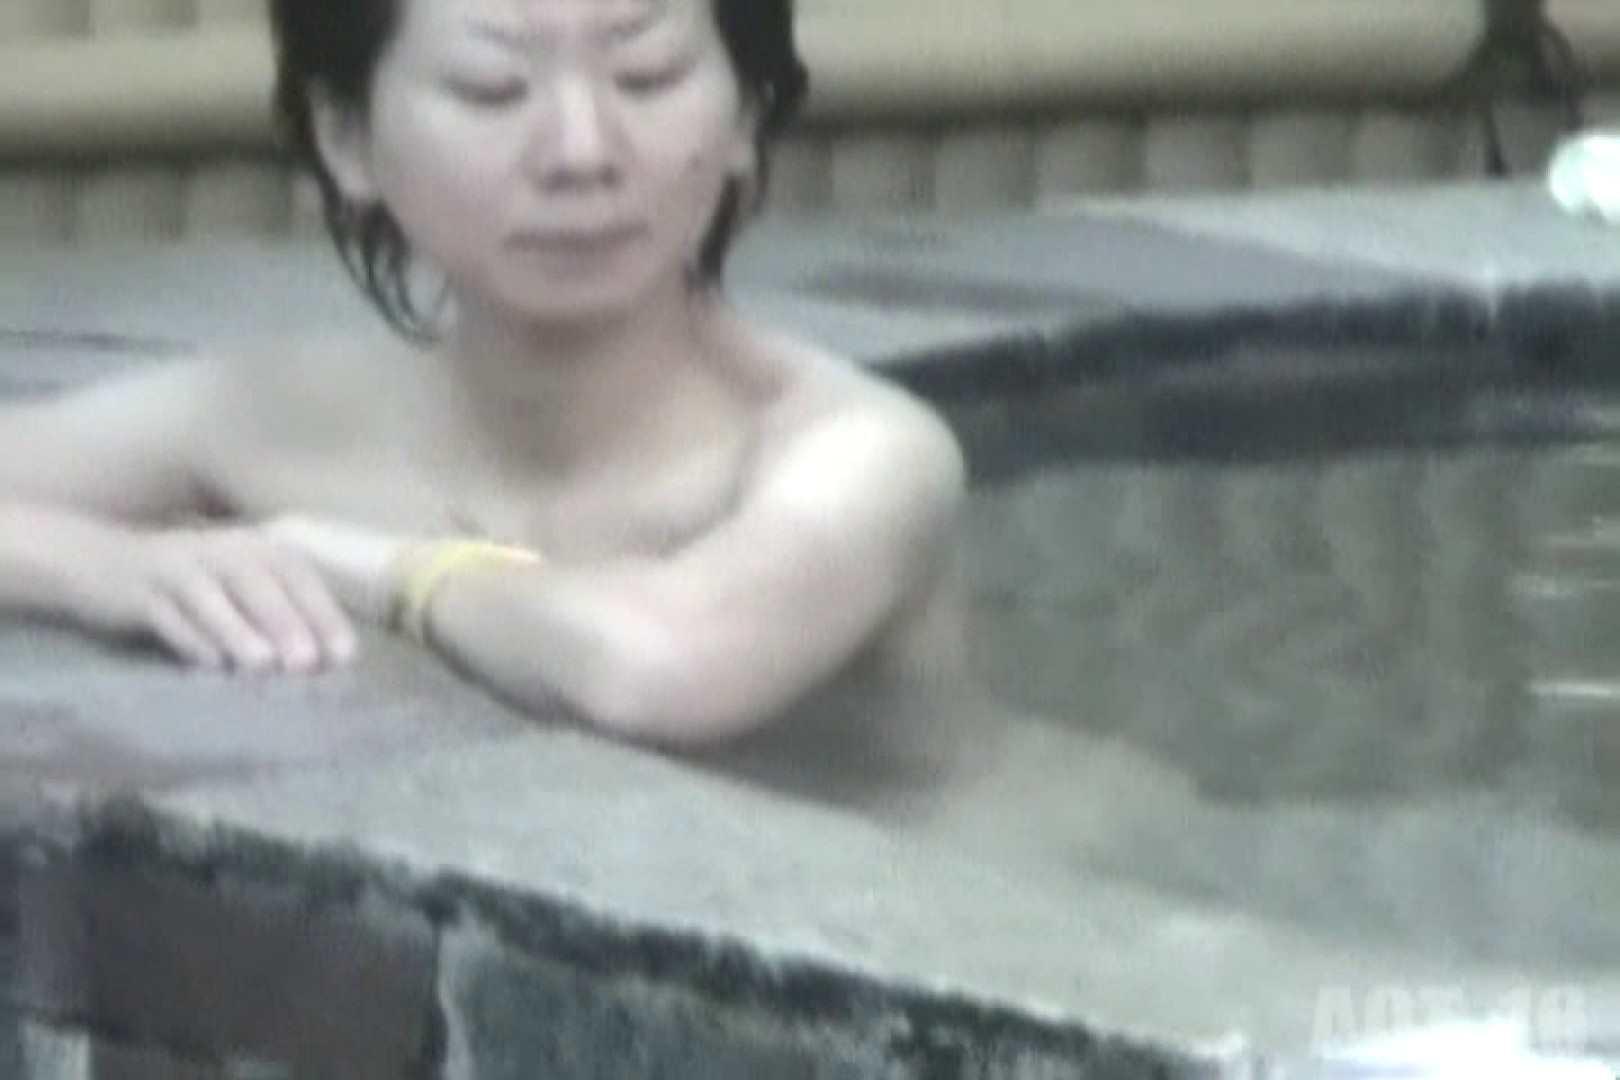 Aquaな露天風呂Vol.842 露天風呂編  82PIX 52